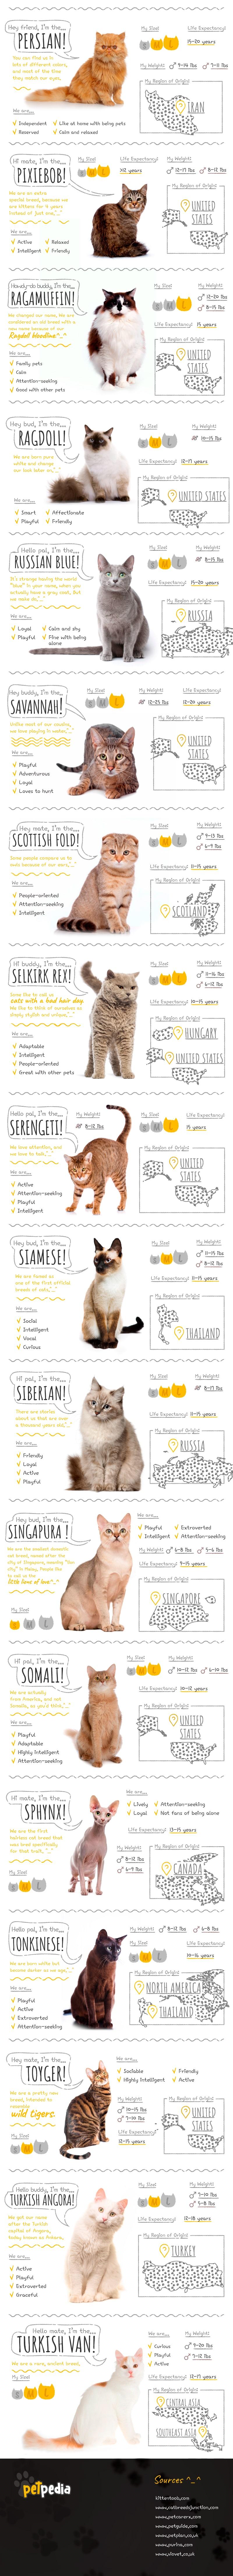 Adopting the right cat - 50 most popular cat breeds (2)